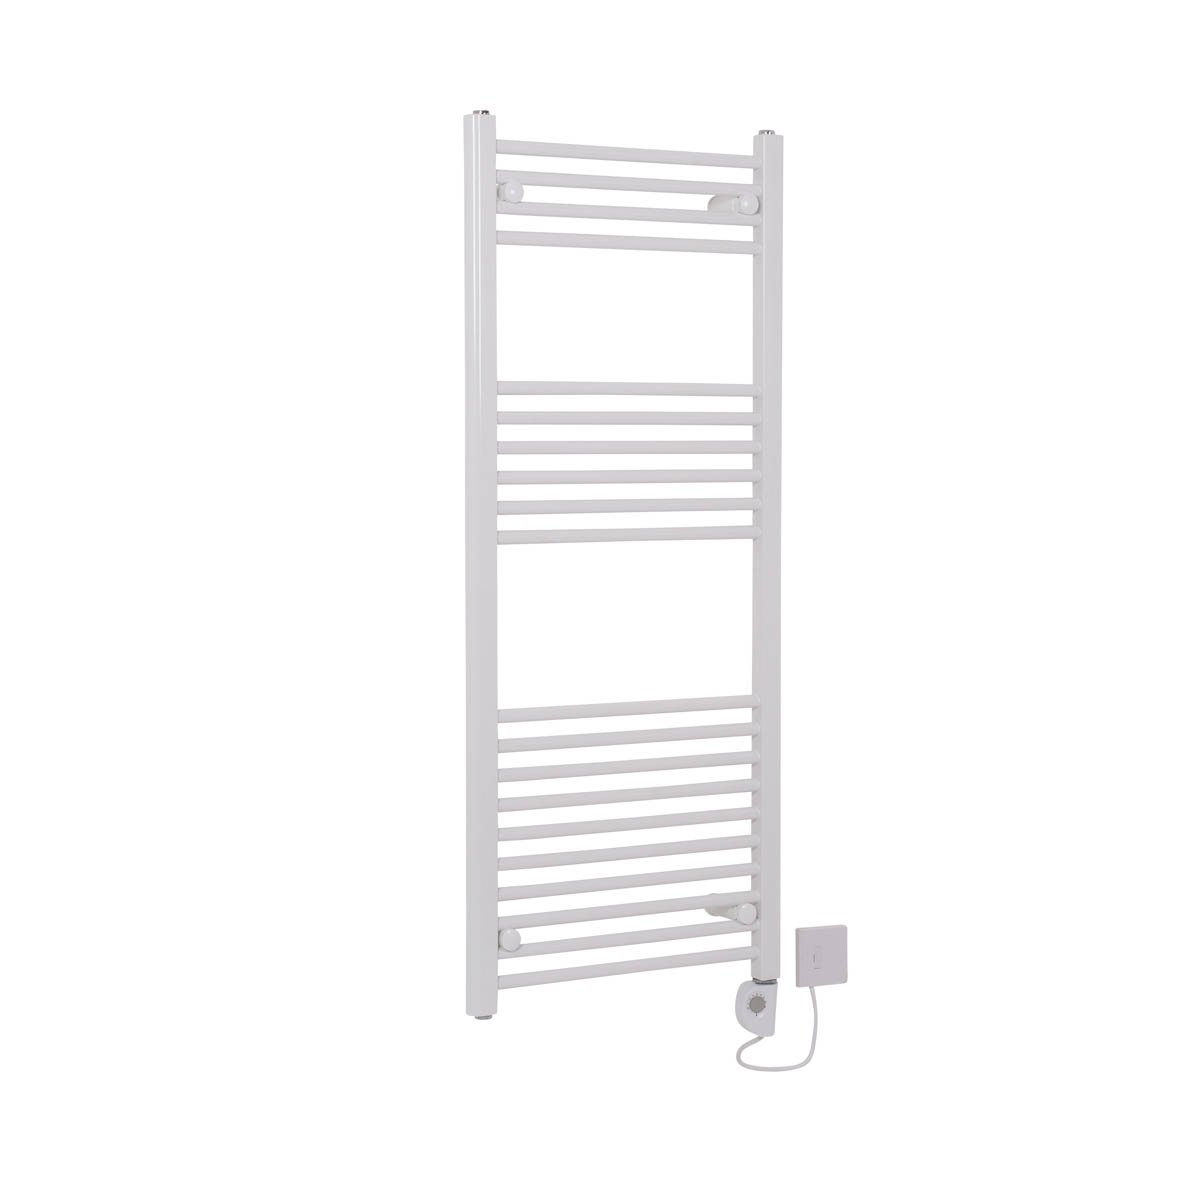 Bathroom White Electric Ladder Heated Towel Rail Warmer